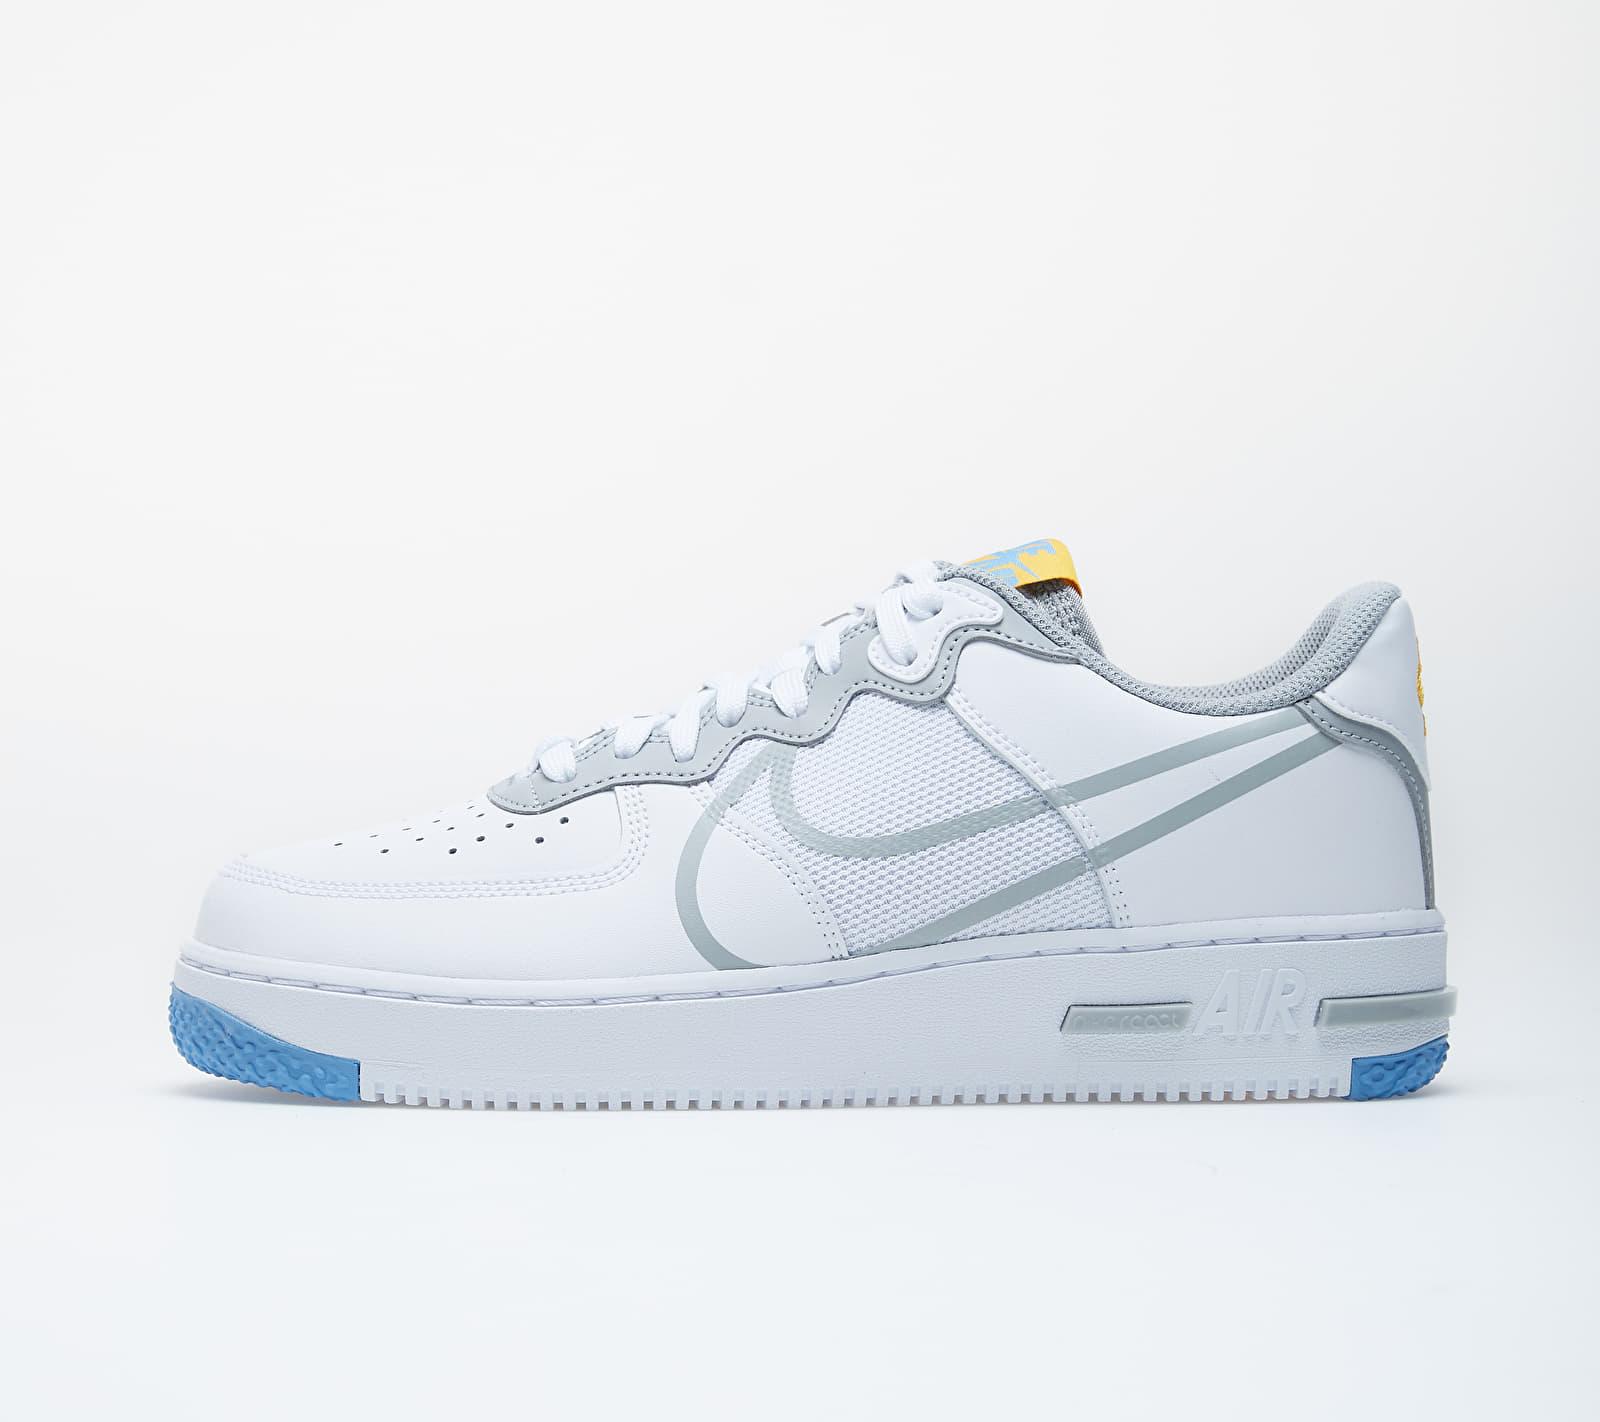 Nike Air Force 1 React White/ Lt Smoke Grey-University Gold CT1020-100